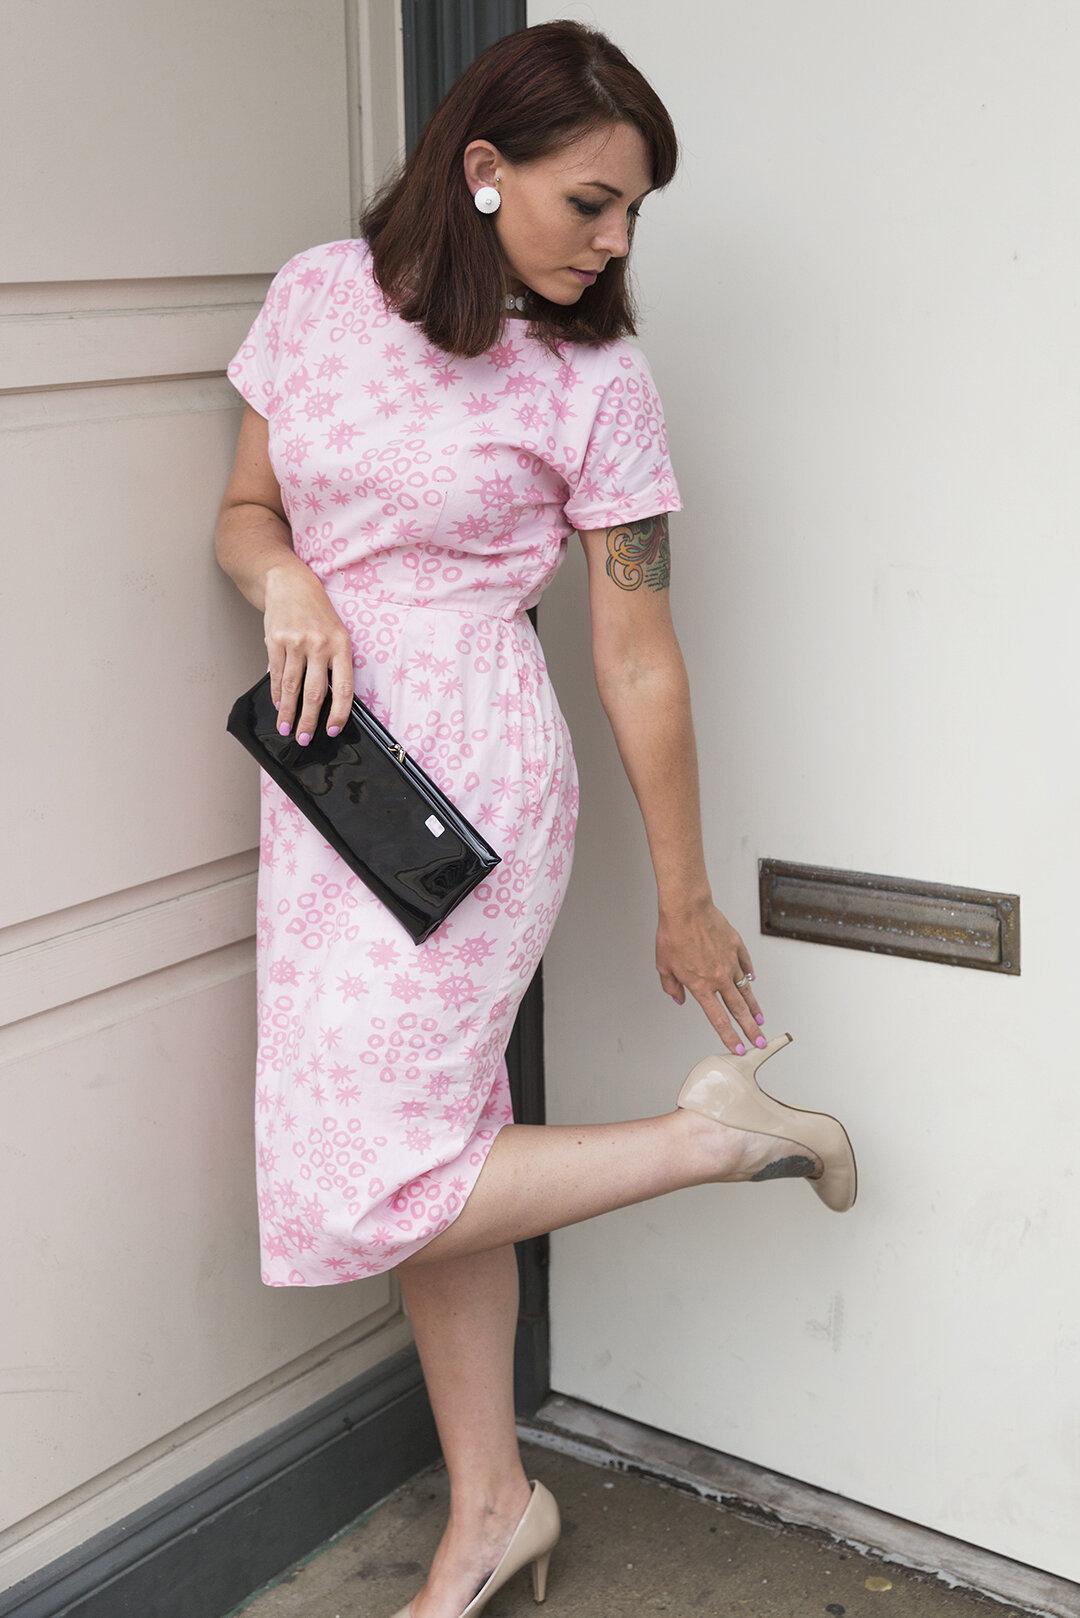 J_pinkdress.jpg